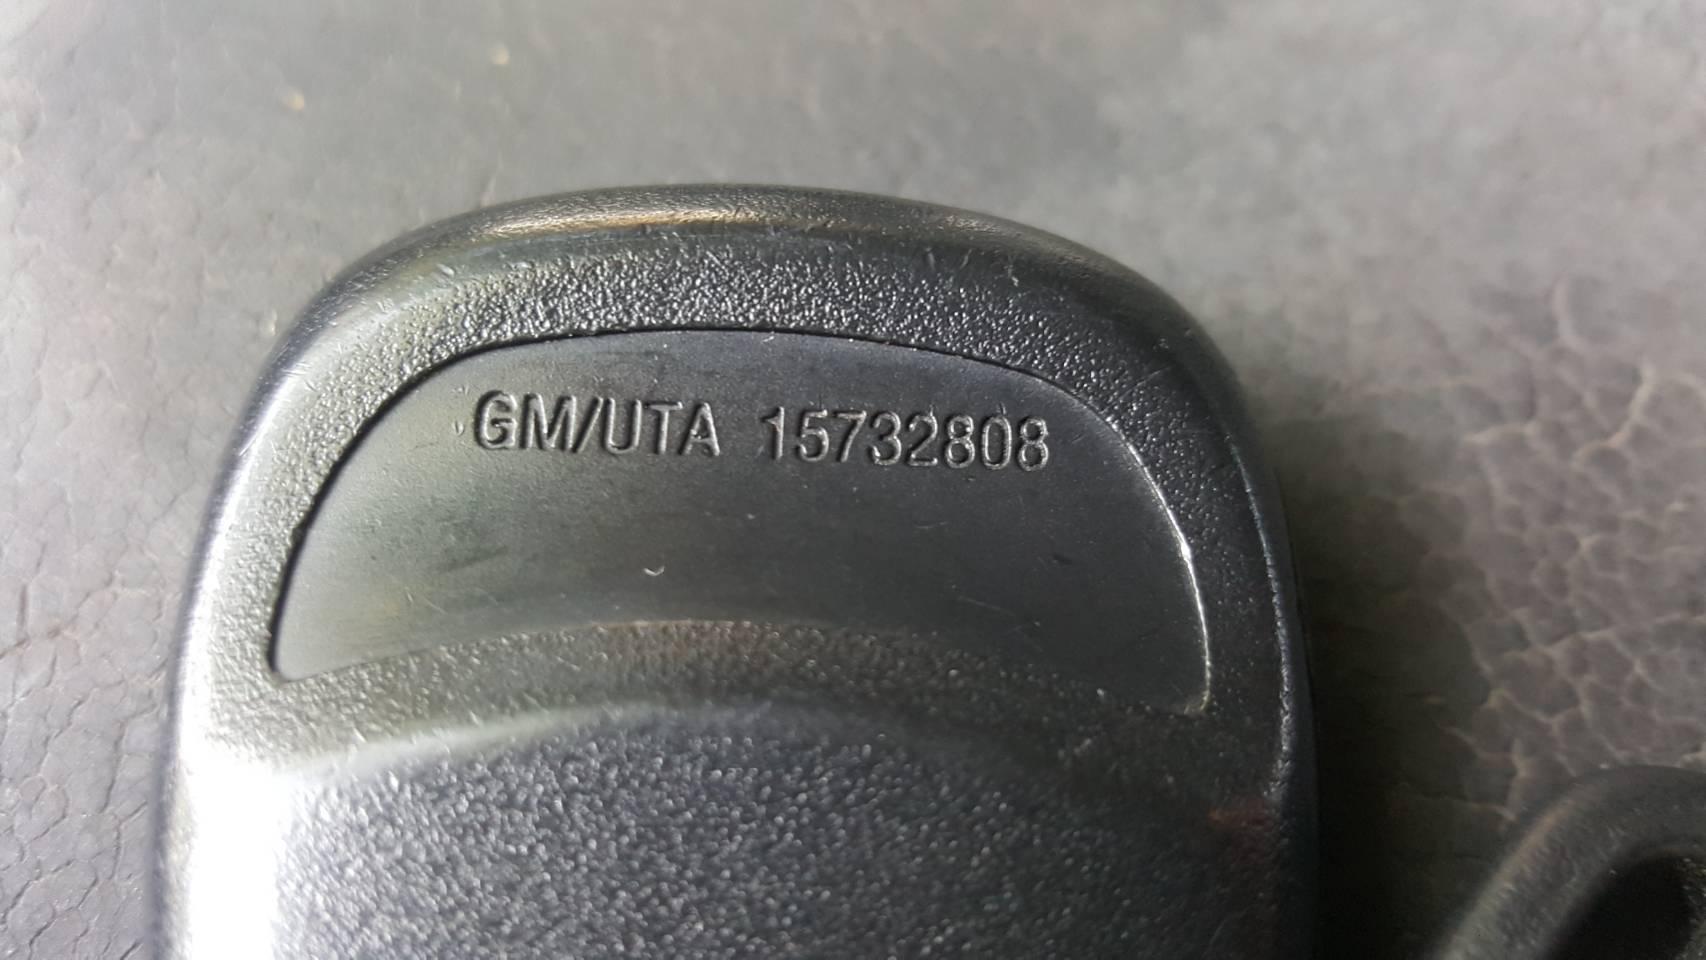 15732808, Transmitter GM part